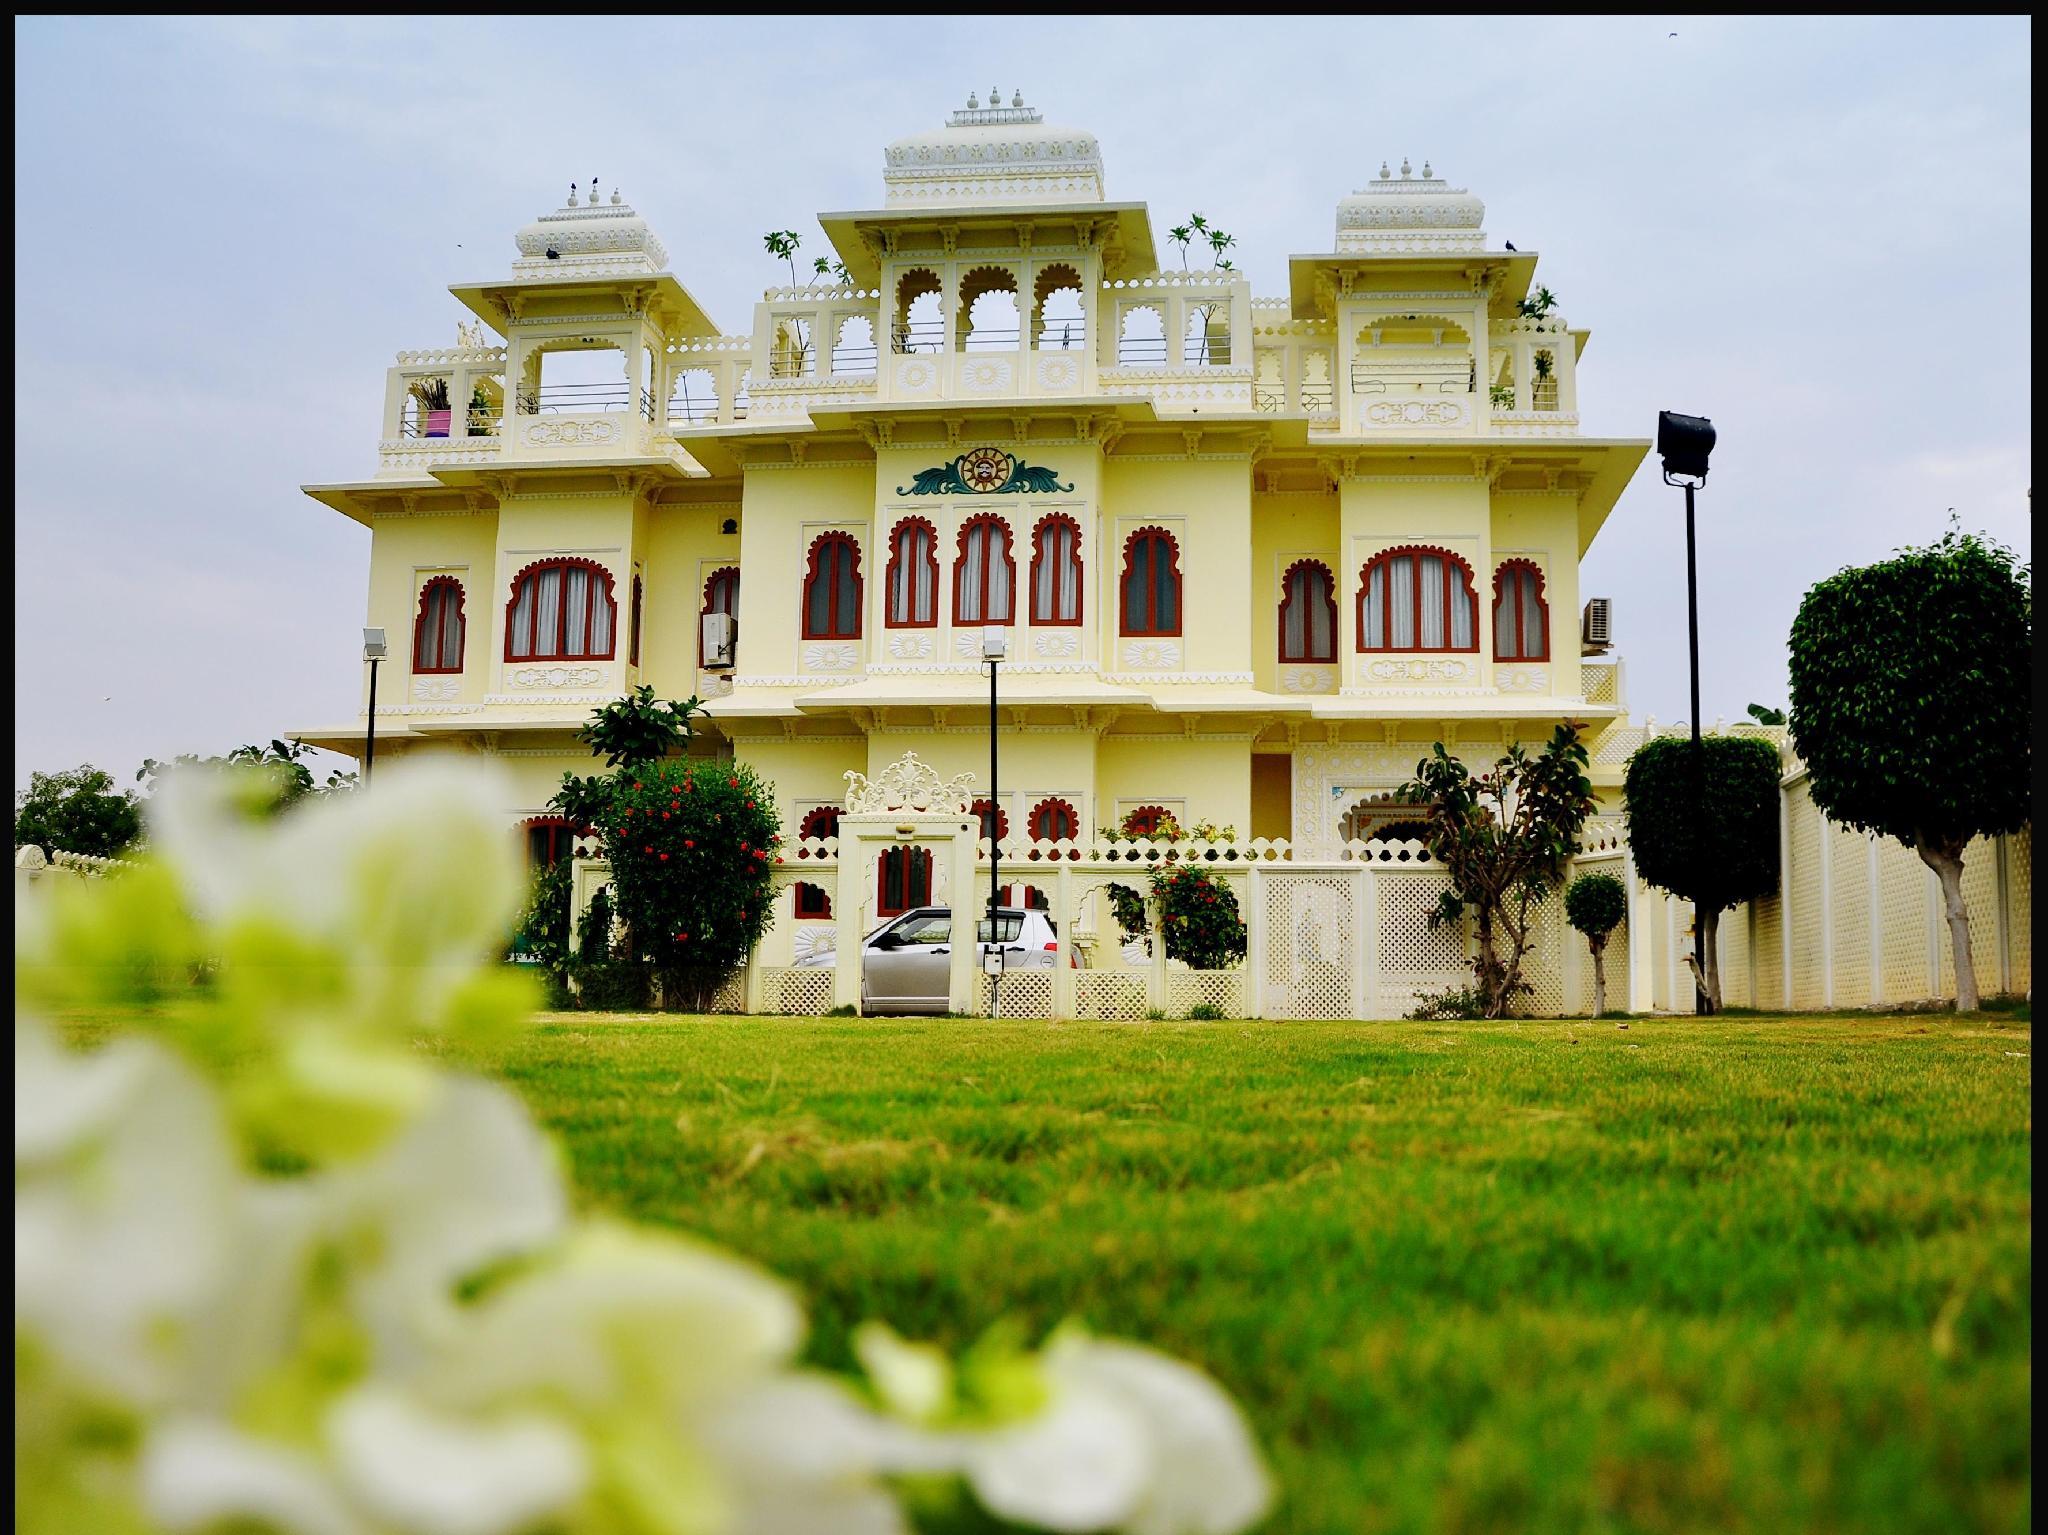 Hotel Jaisingh Garh - Udaipur